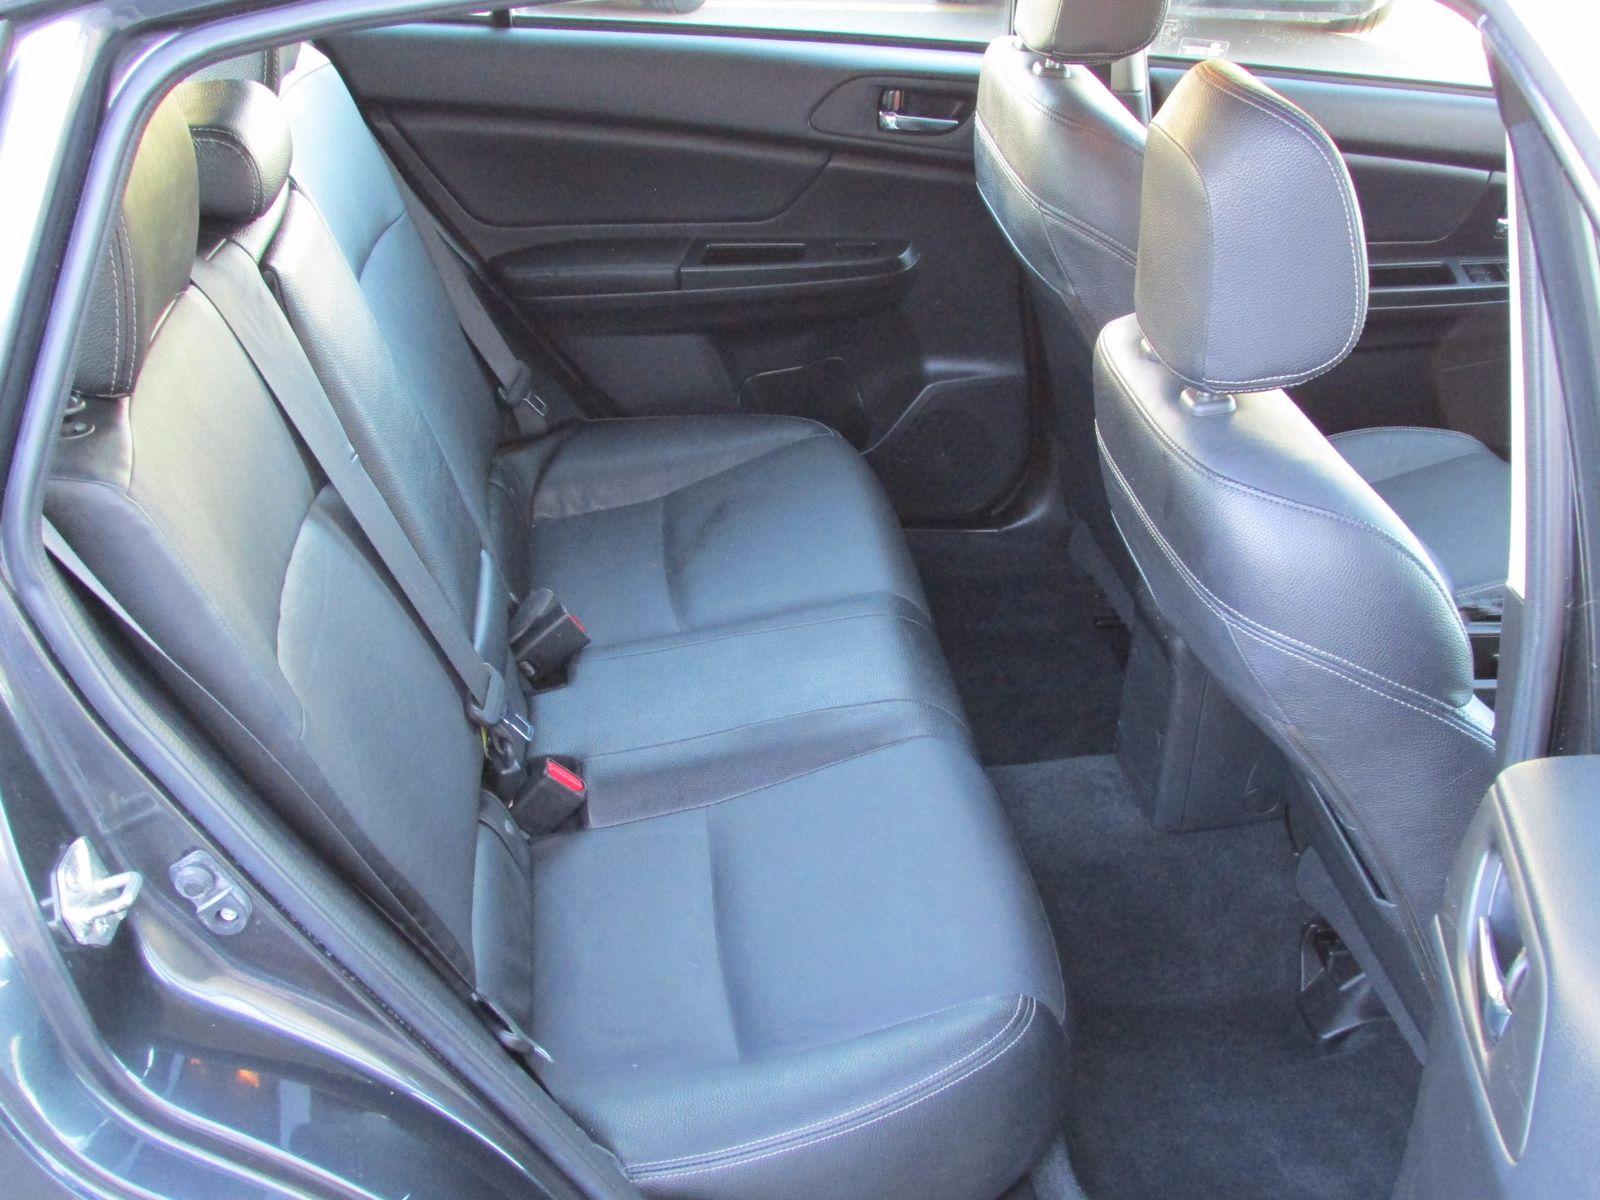 2012 Subaru Impreza 20 Sport Limited Edition Wagon city Utah Autos Inc